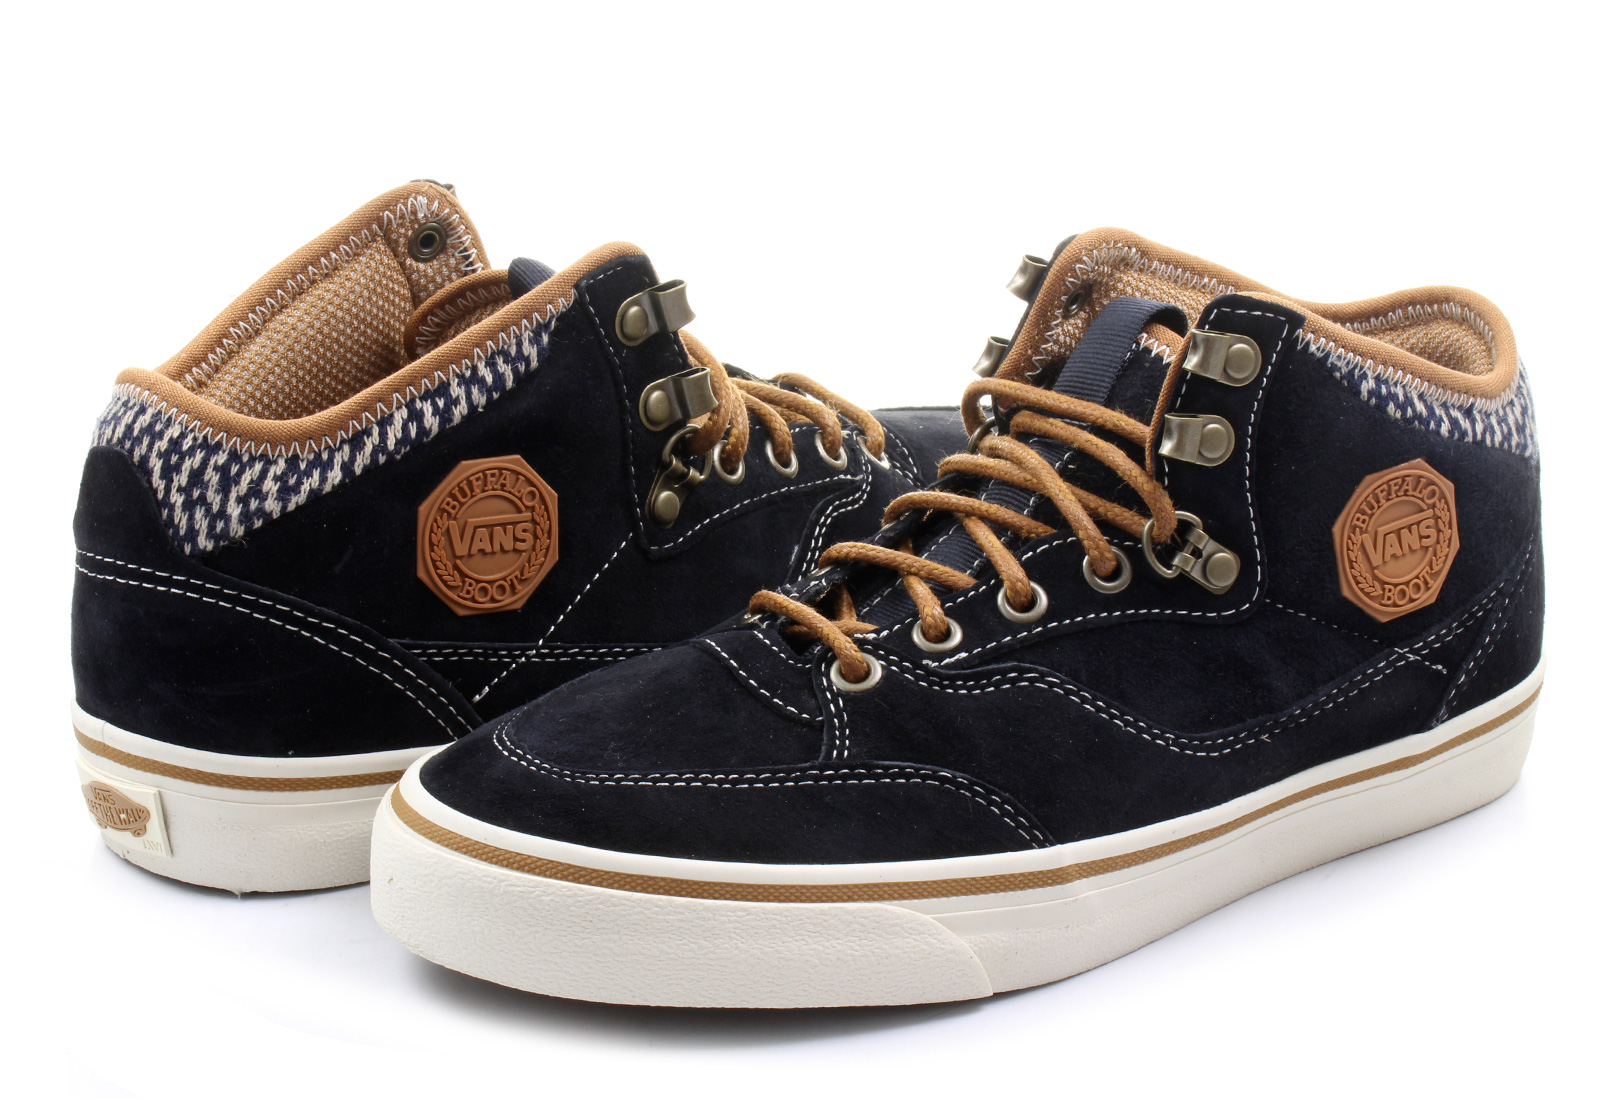 Vans Tornacipő - Buffalo Boot Mte - V183GT9 - Office Shoes Magyarország b98db1c275